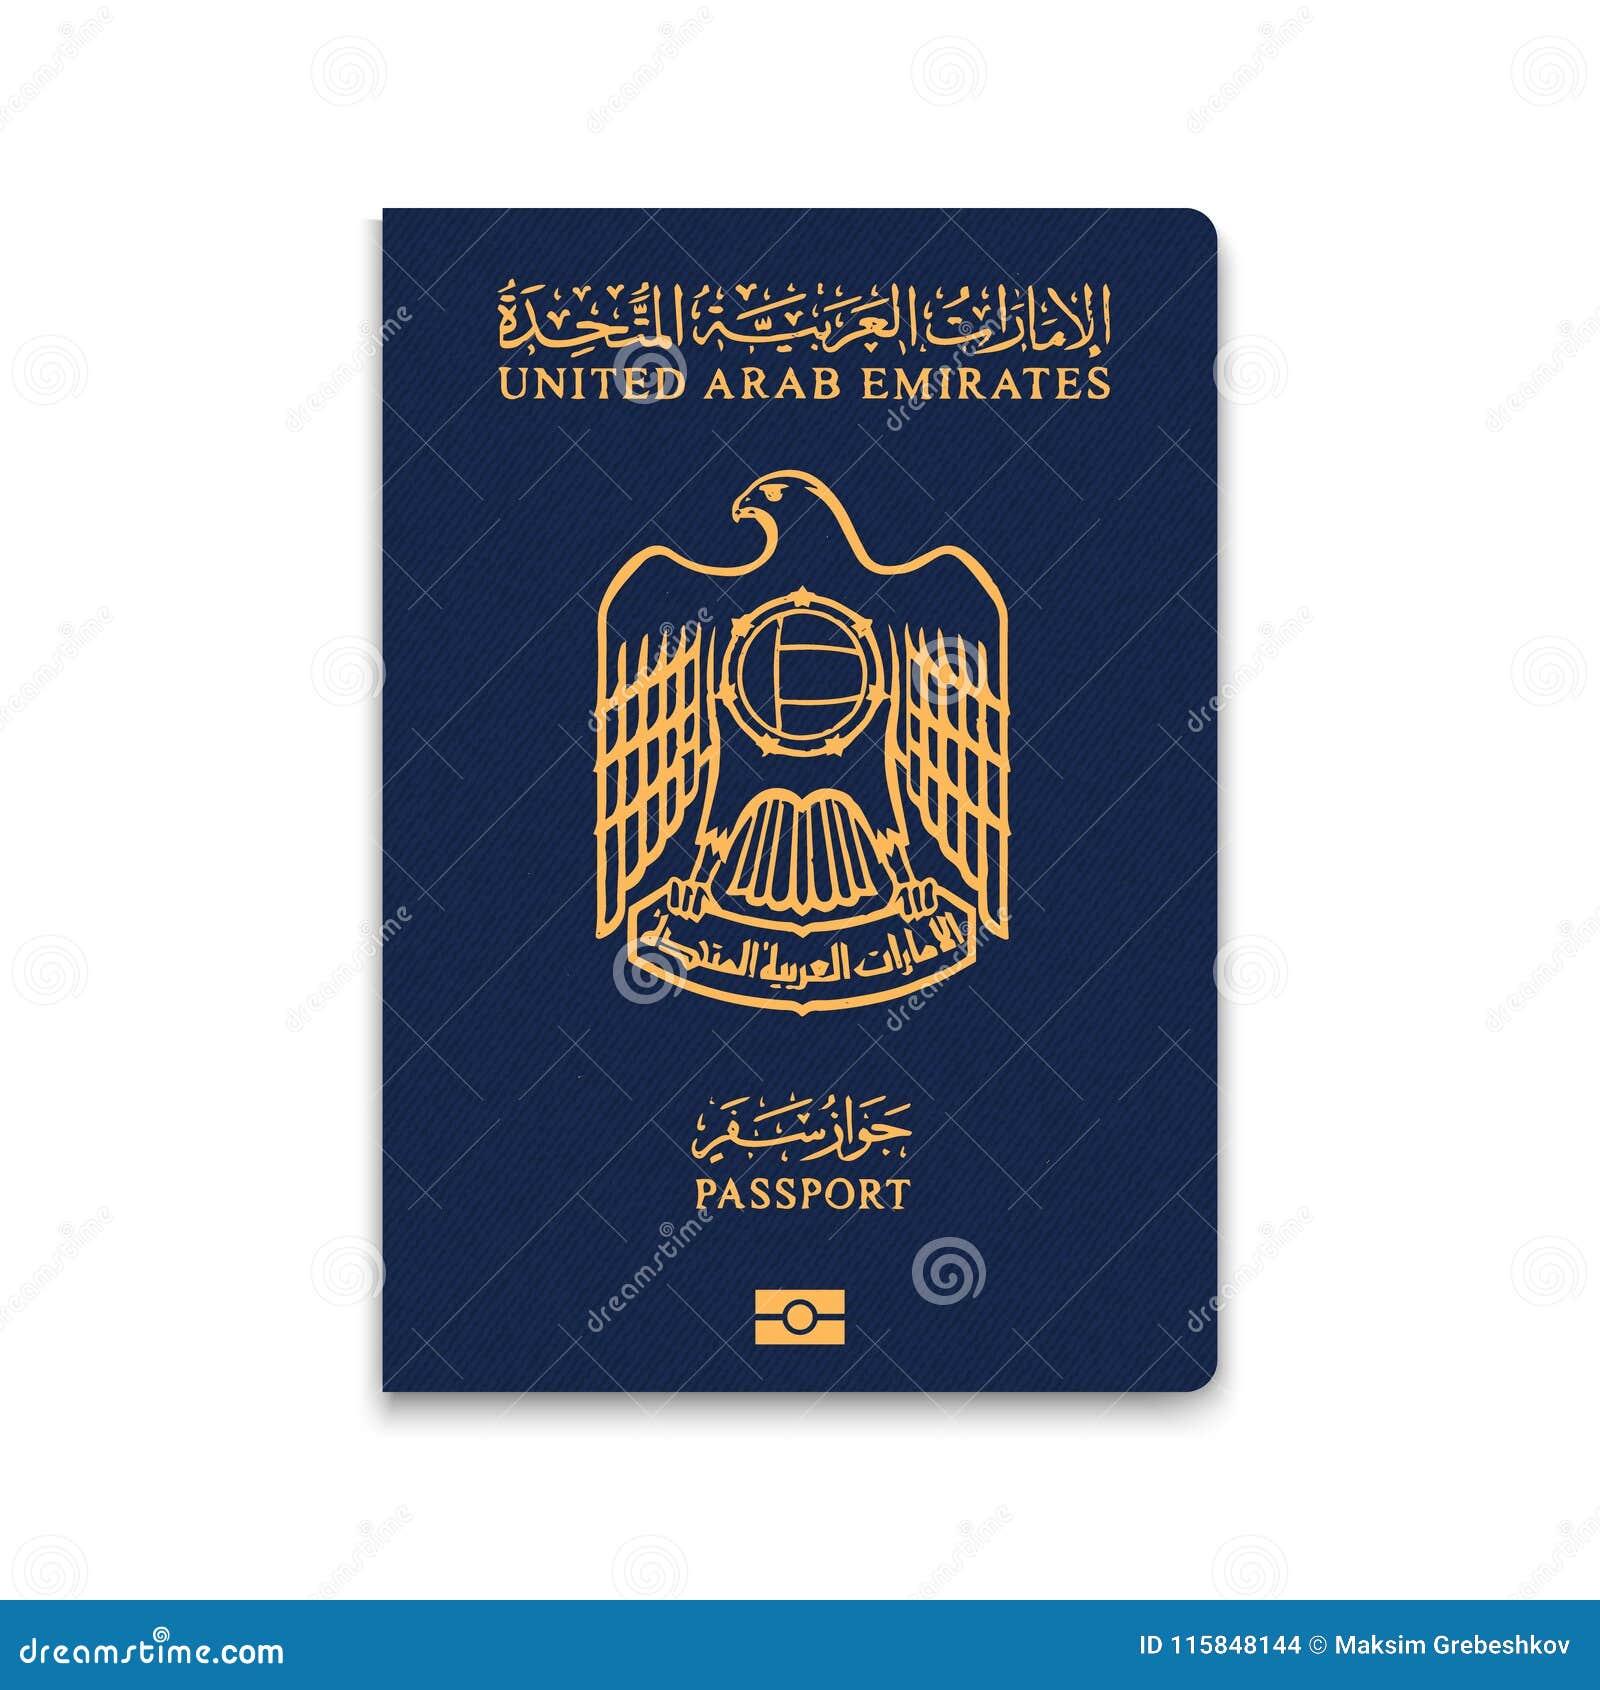 Passport vector illustration